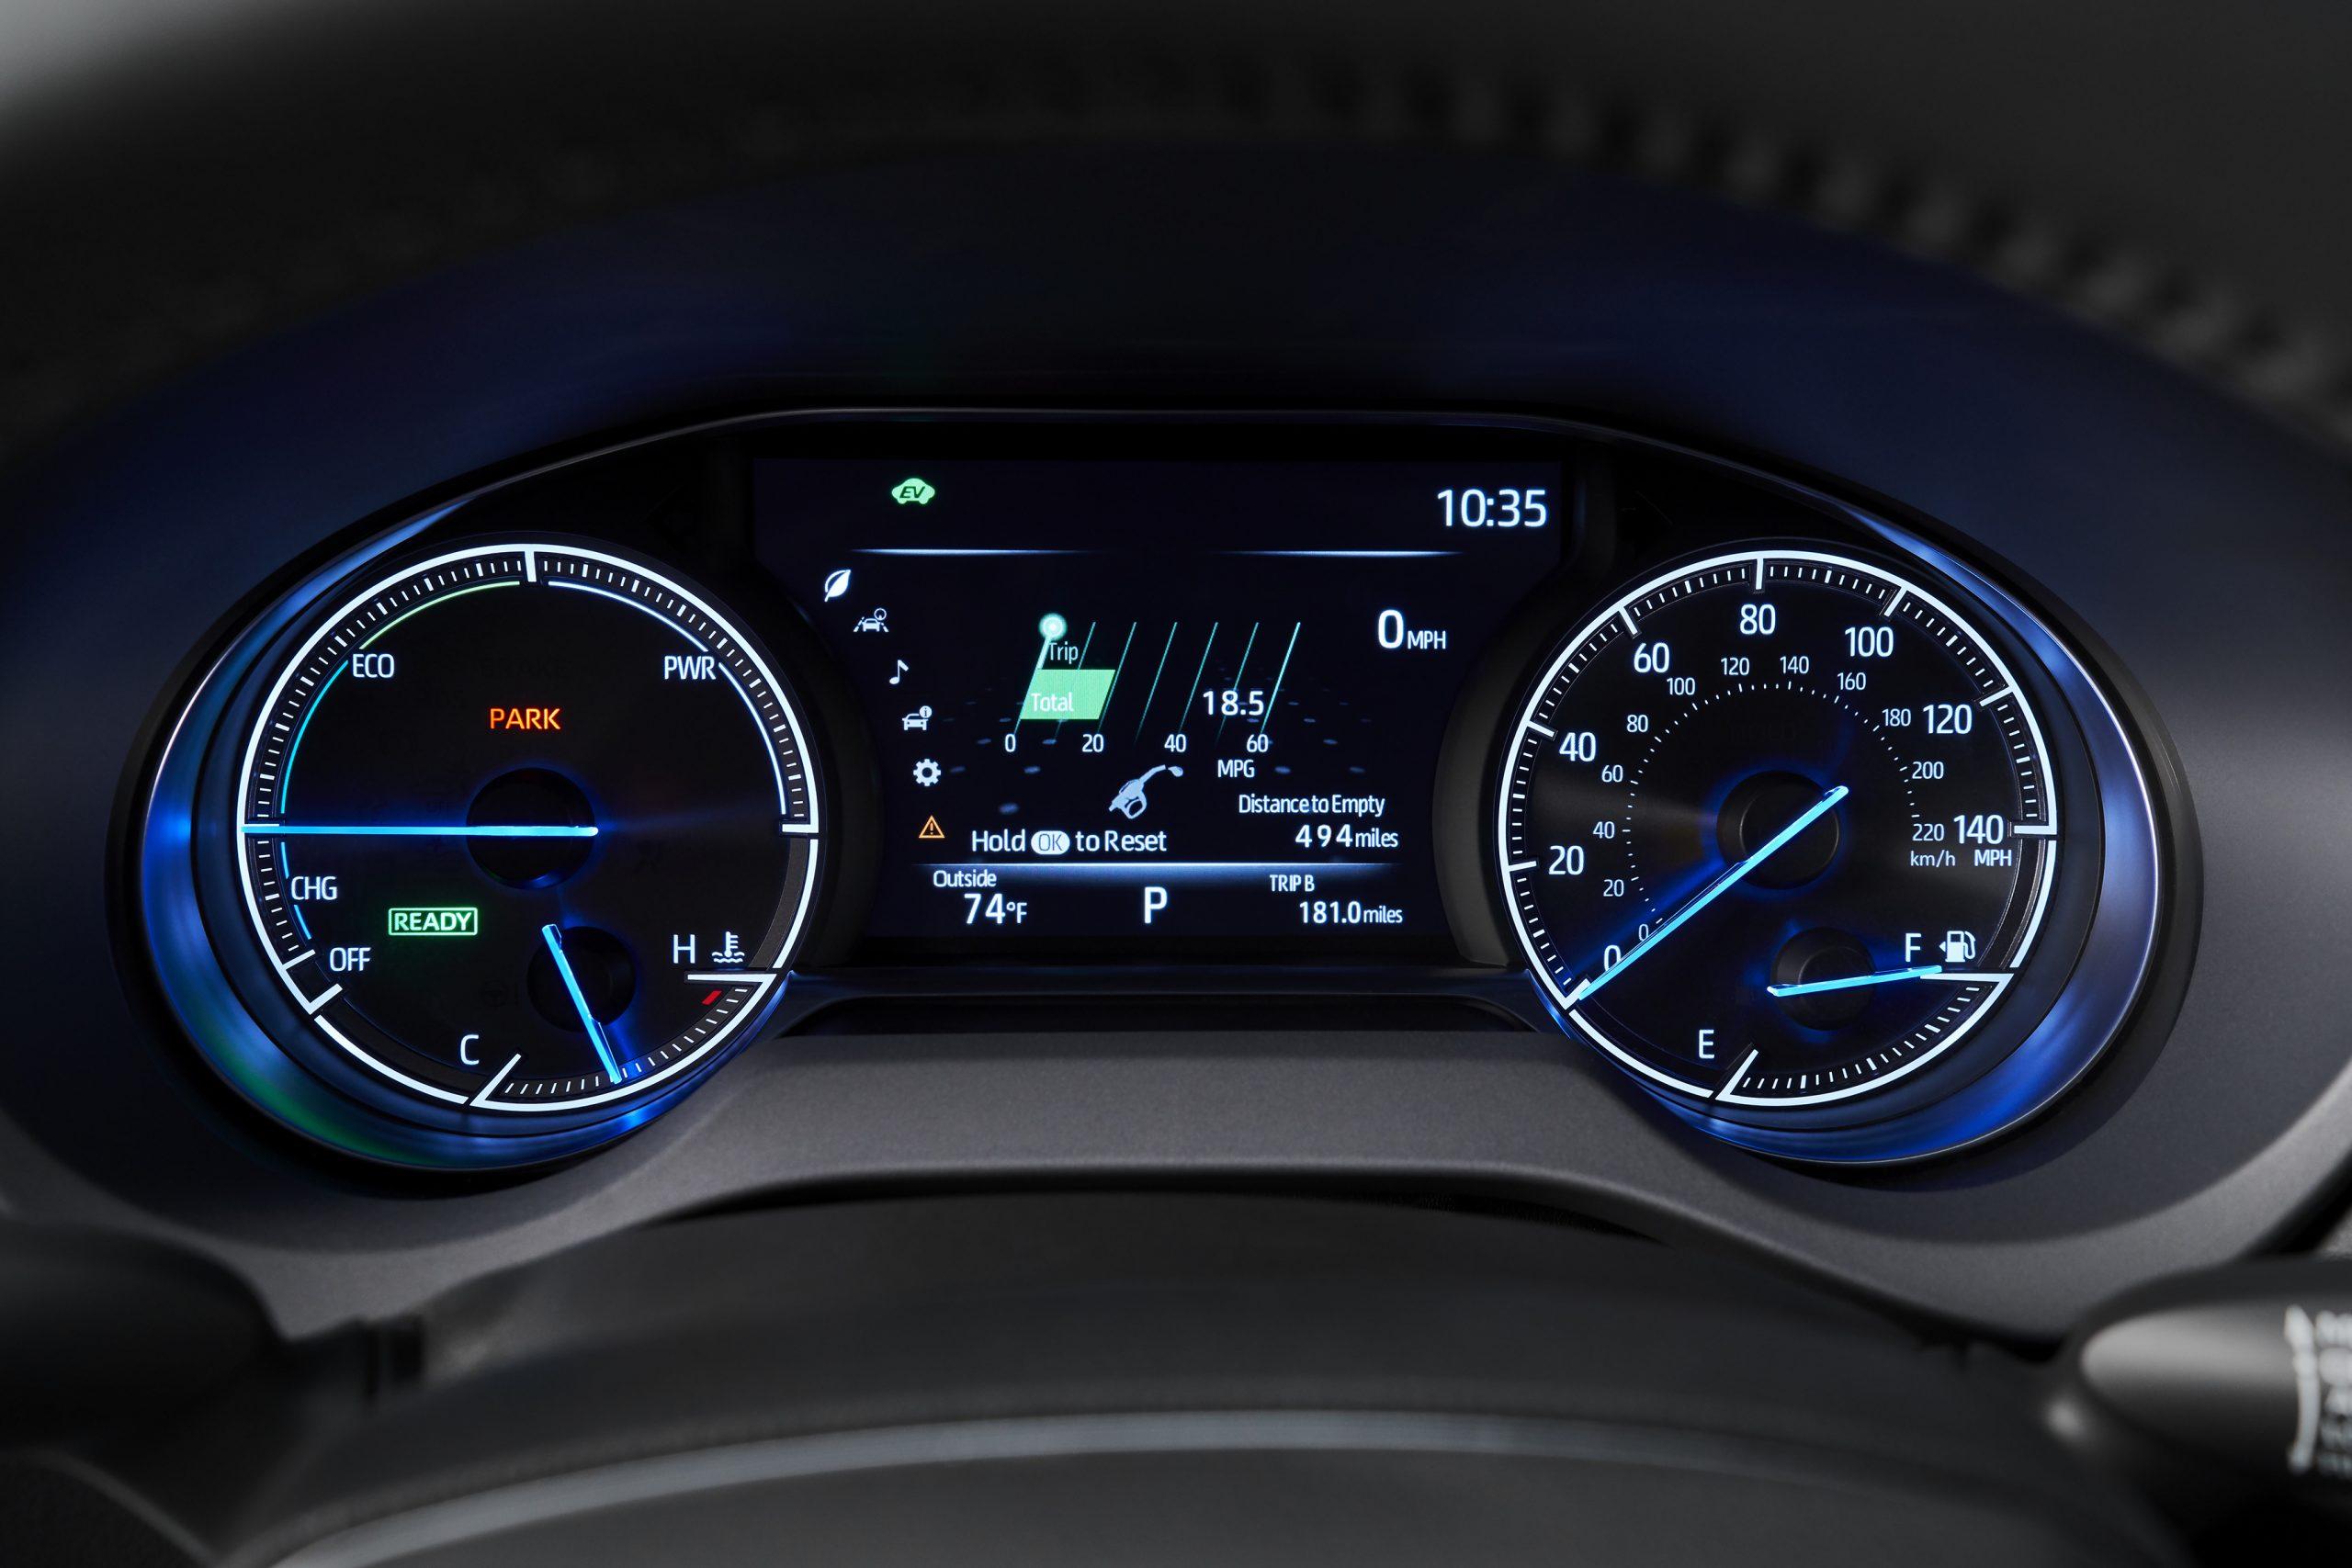 2021-Toyota-Venza_Interior_005-scaled.jpg